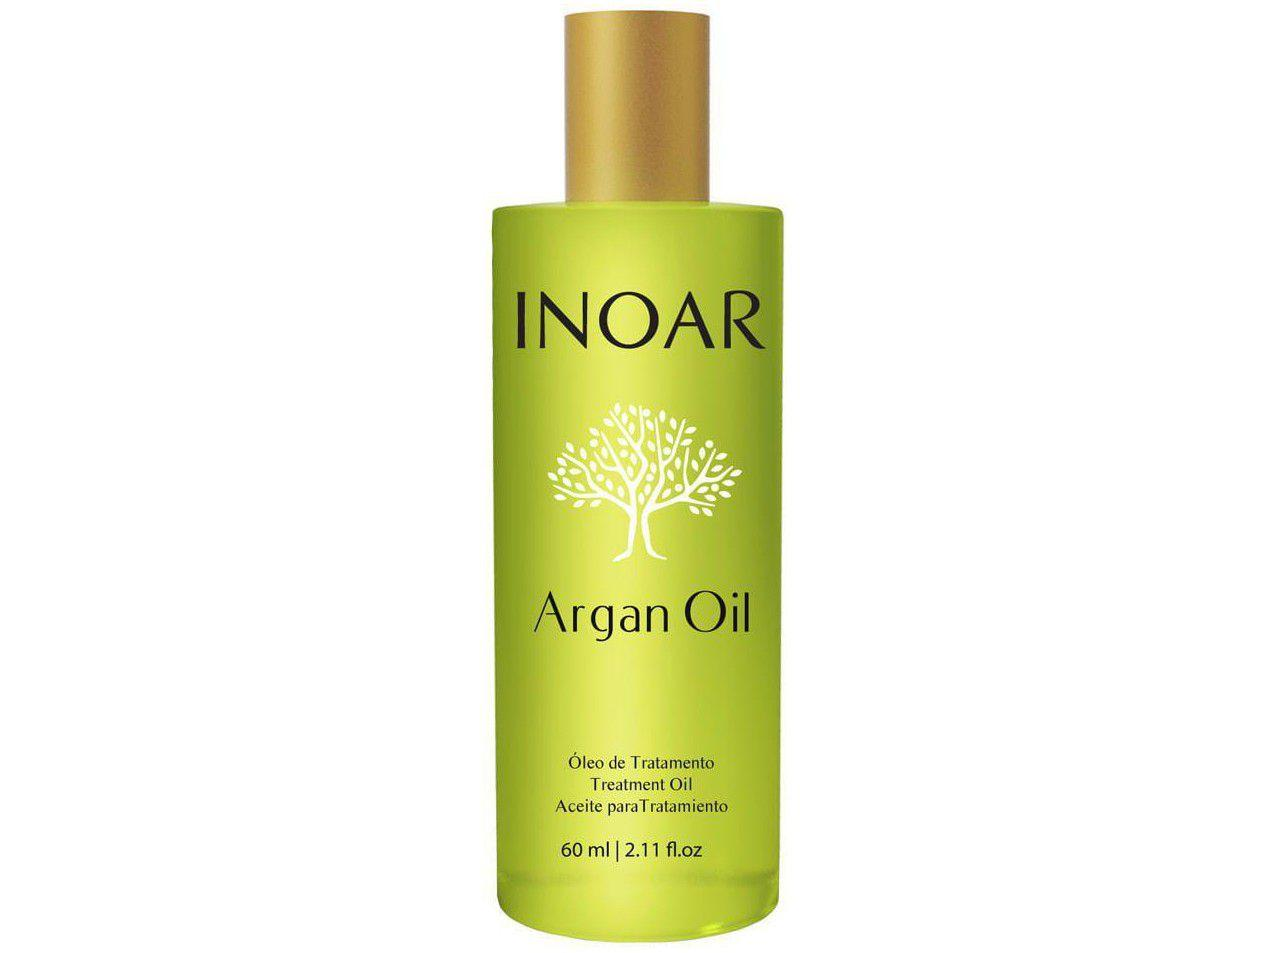 Inoar Óleo de Tratamento Argan Oil - Tratamento Disciplinador